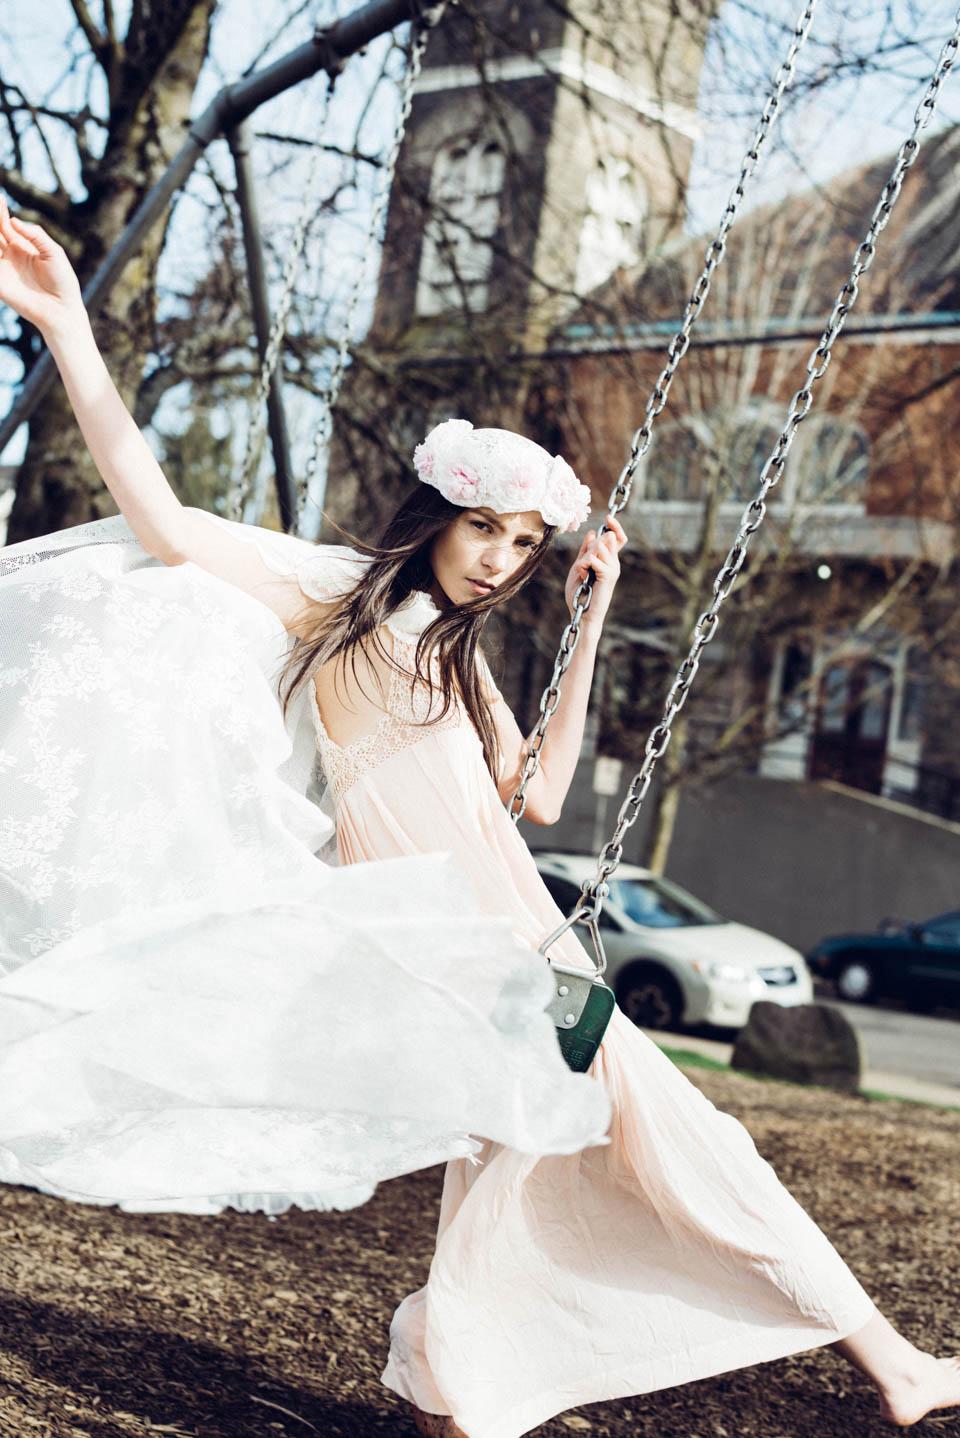 fashion editorial for jute shot in portland by fashion photographer erika astrid_51.jpg